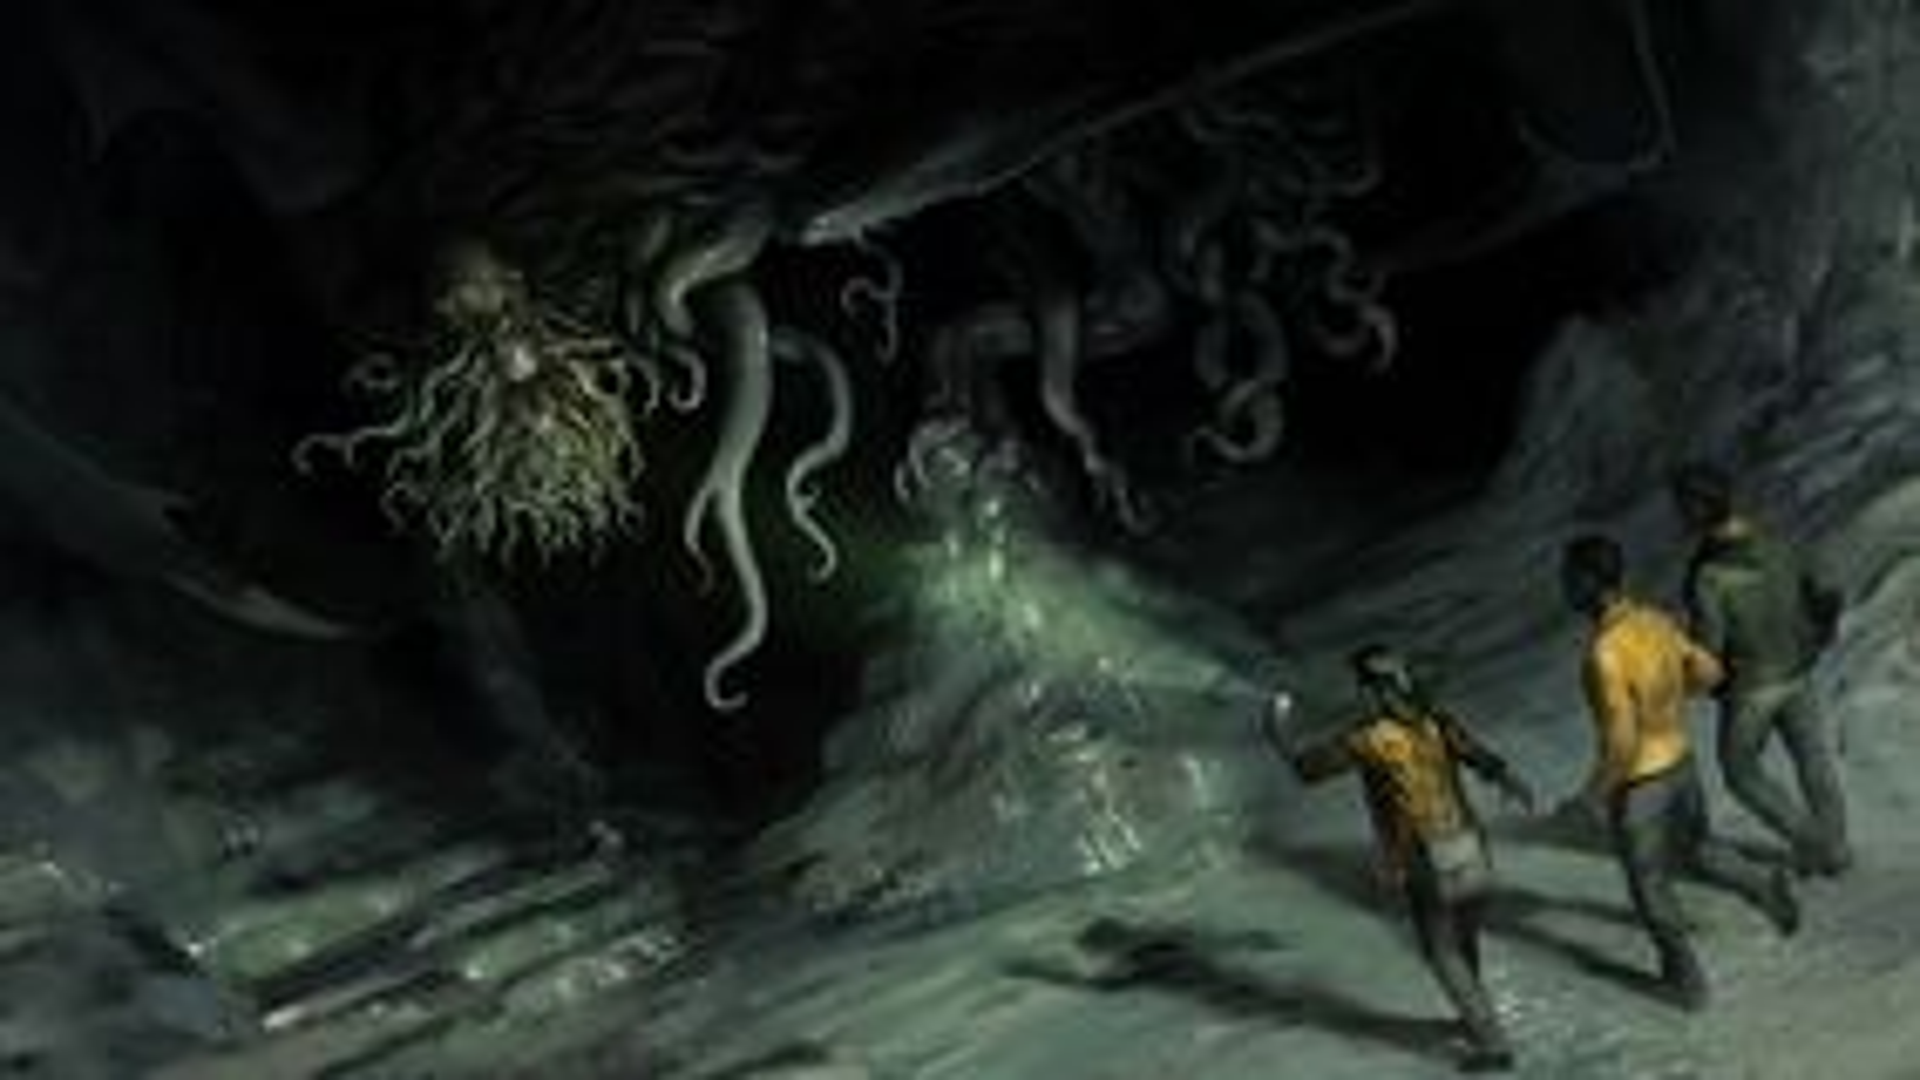 Call of Cthulhu: Terror Paths artwork